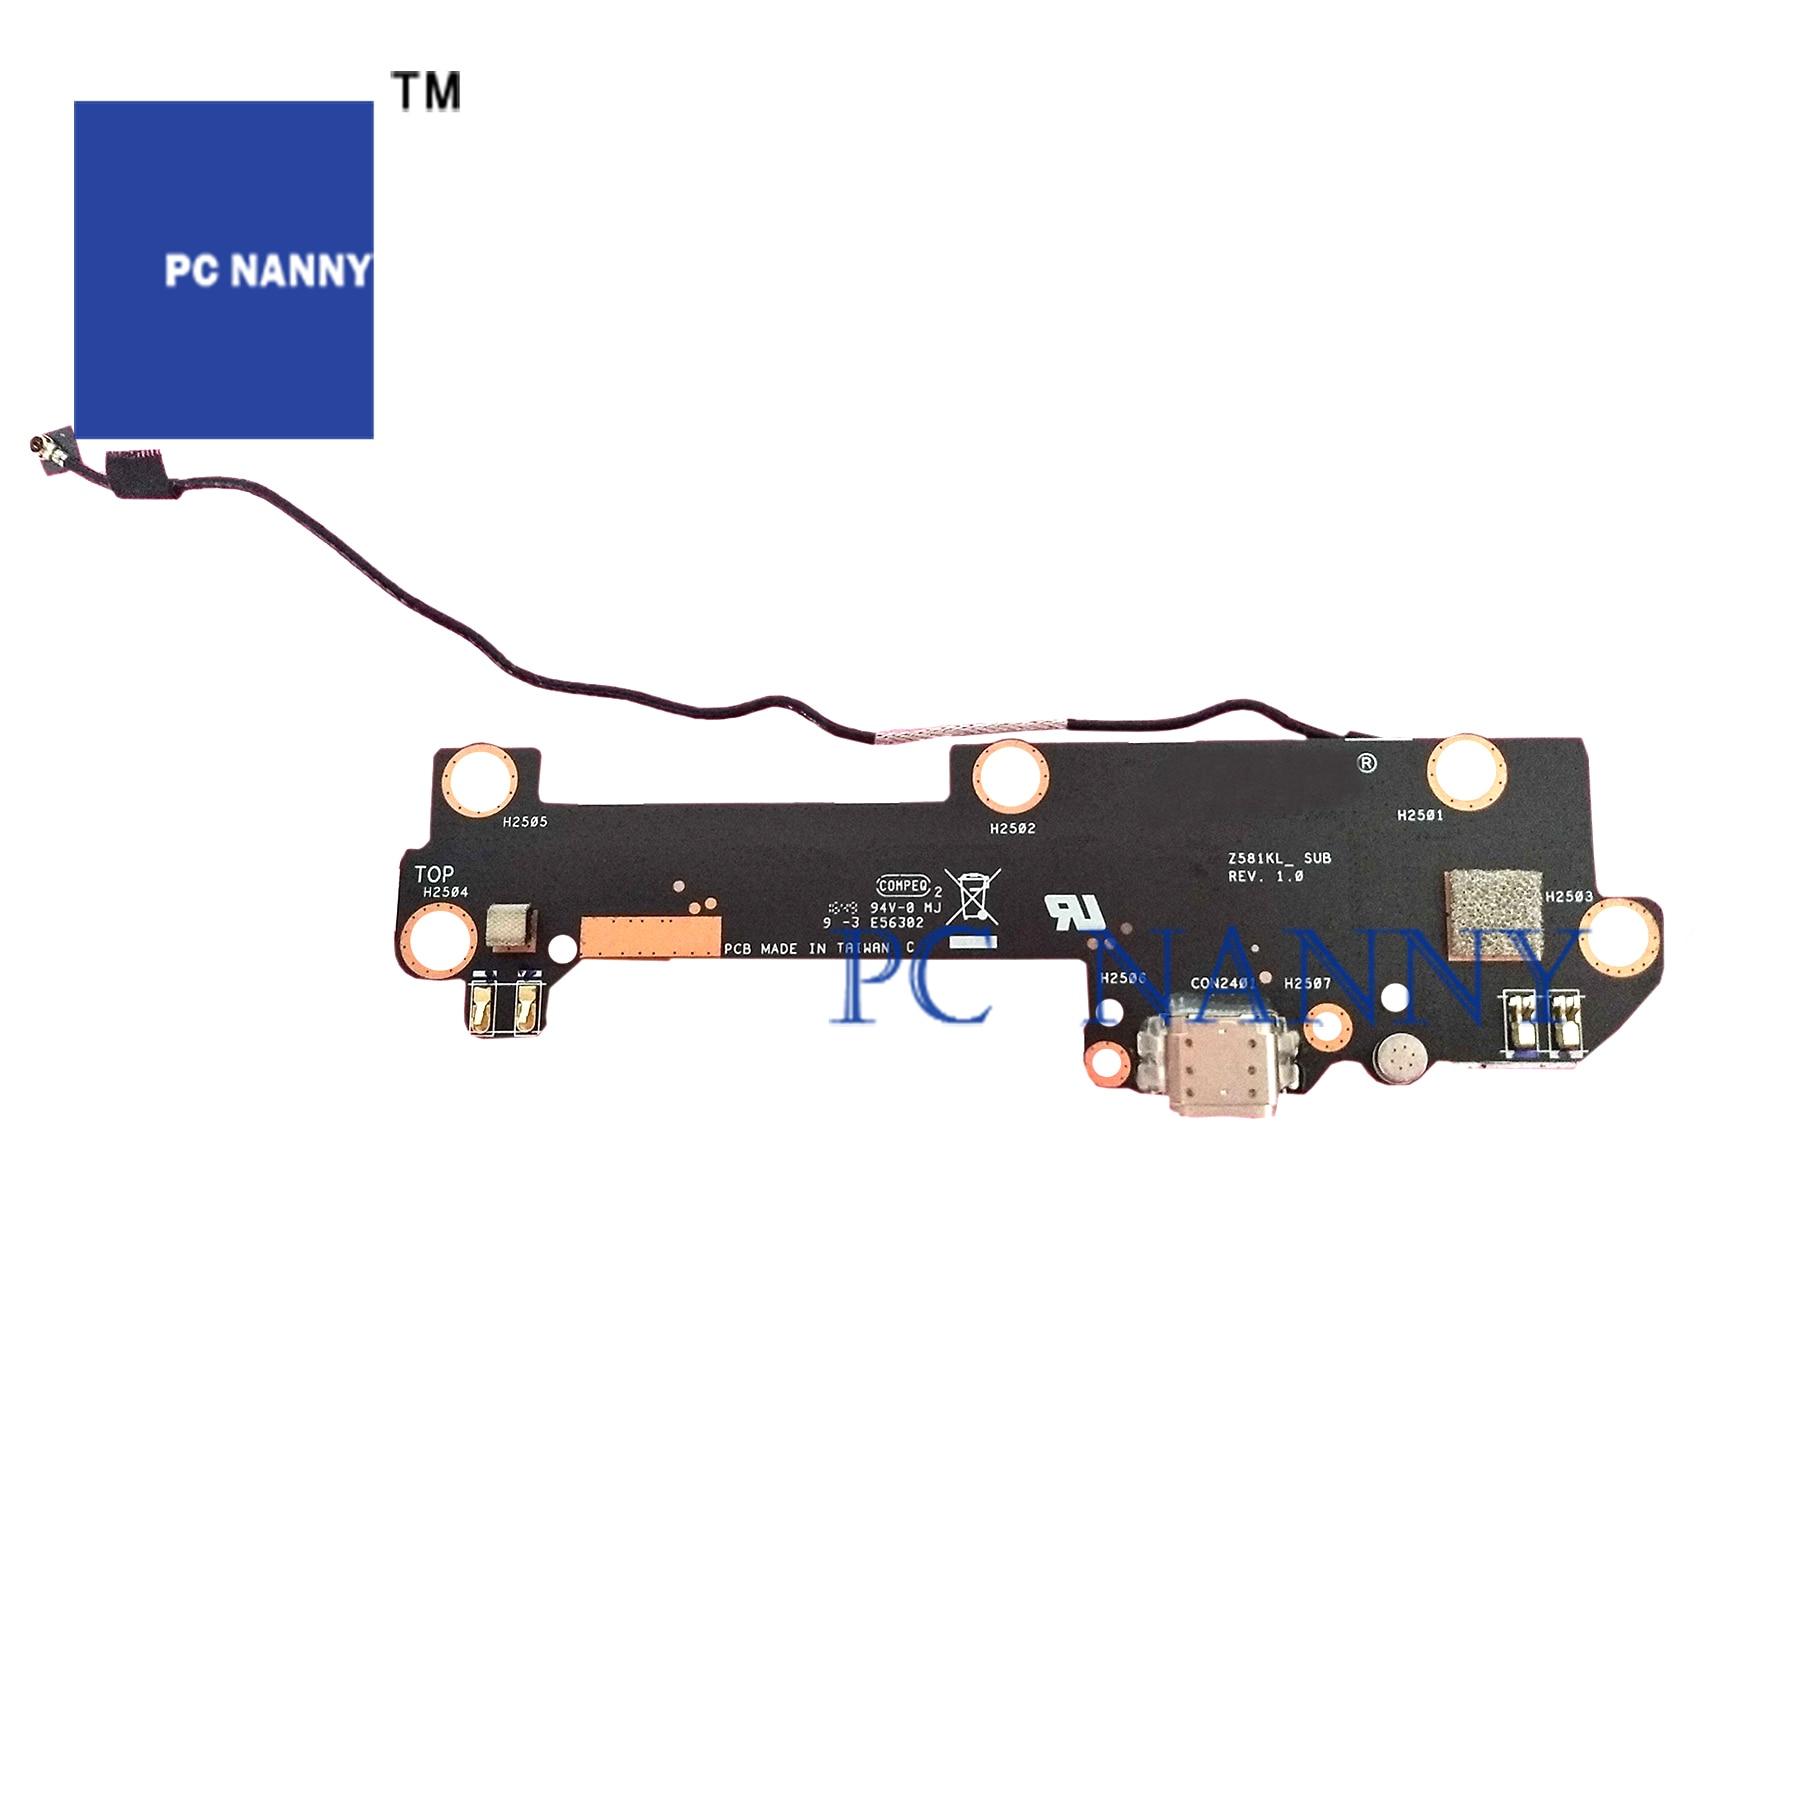 PCNANNY FORASUS ZenPad8 ZT581KL Z581KL P008 Insert Interface Board Test Good